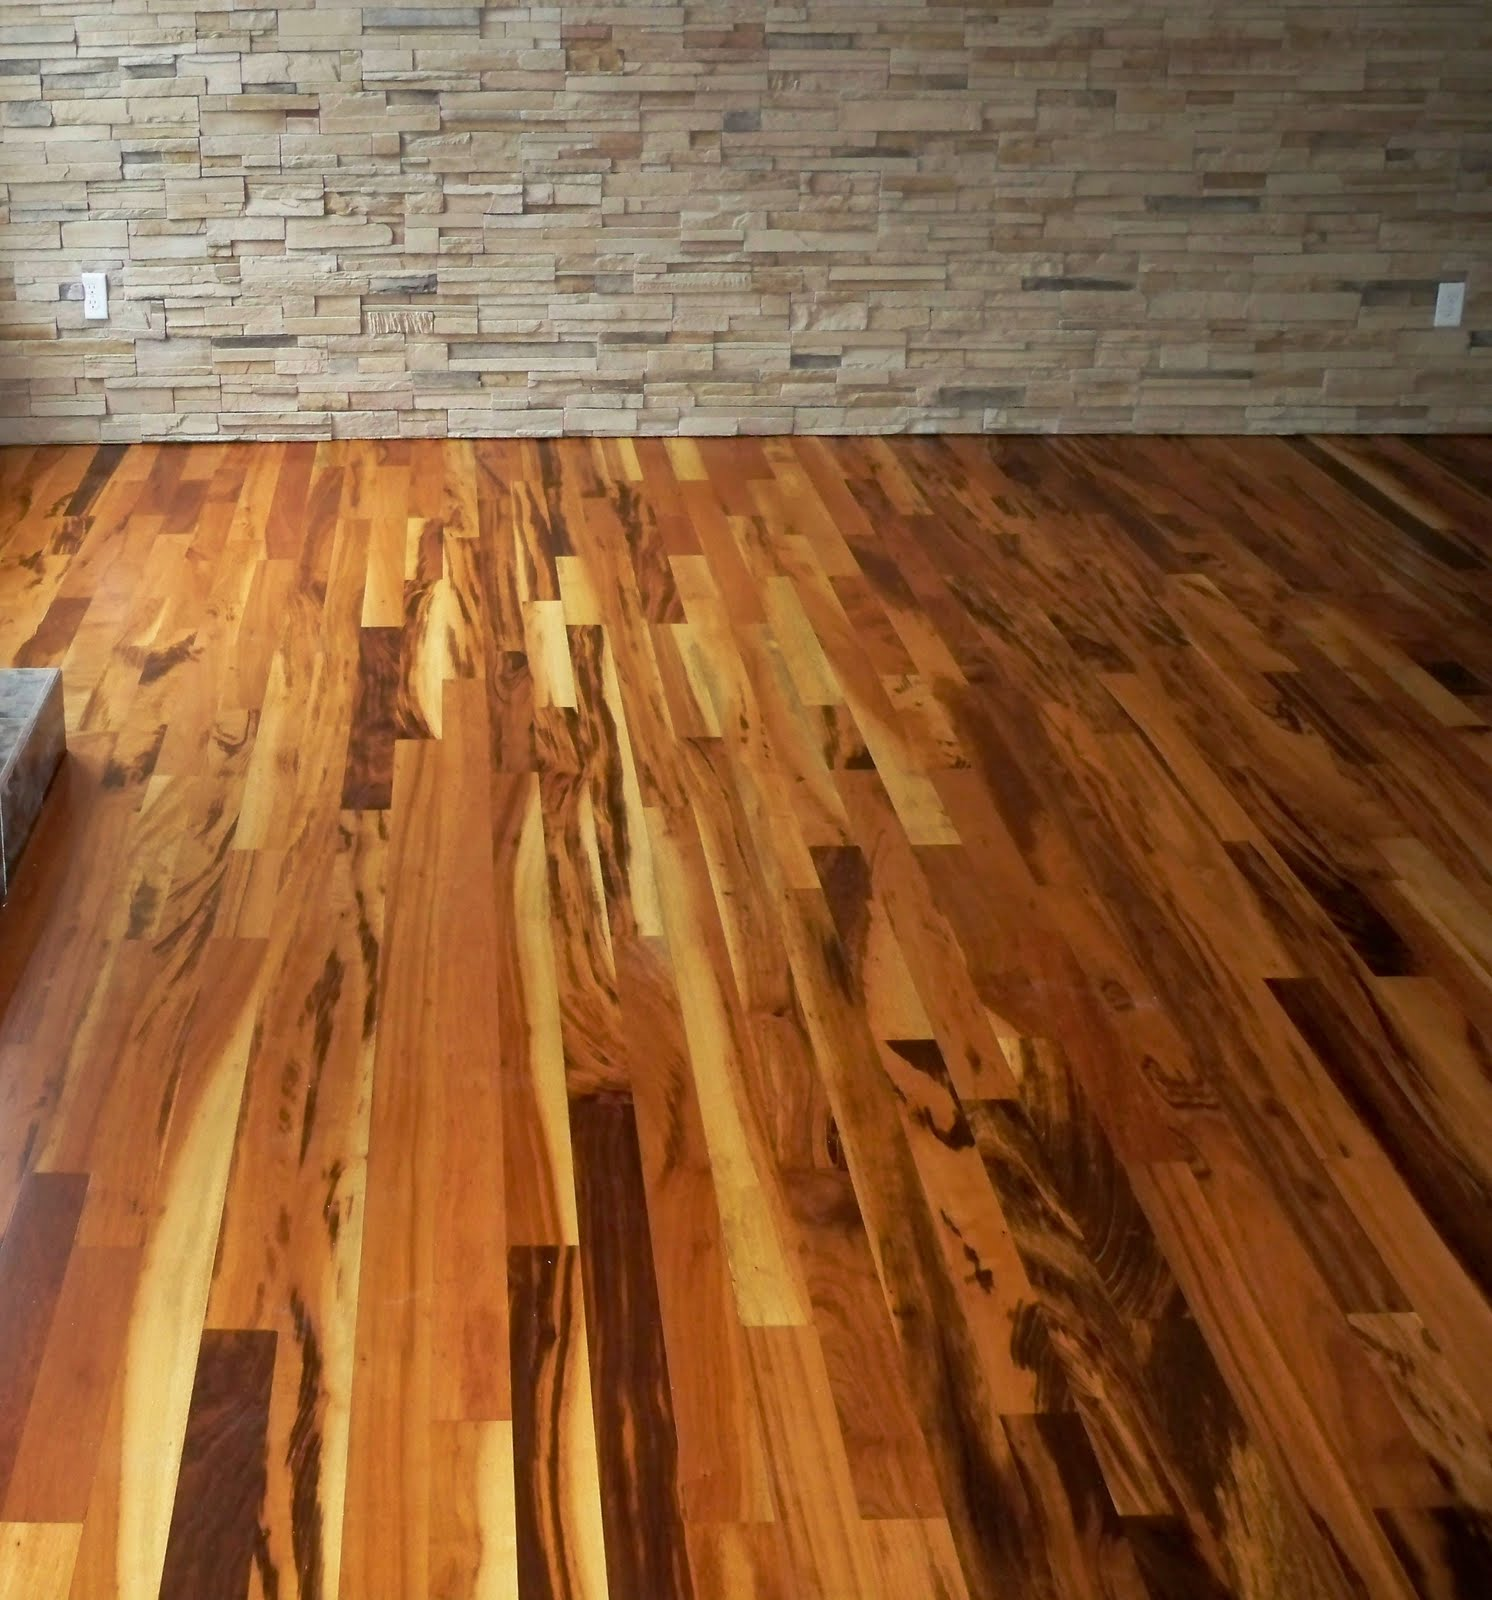 Asesor a en decks docks ironwood duela tigerwood ottawa - Duelas de madera ...